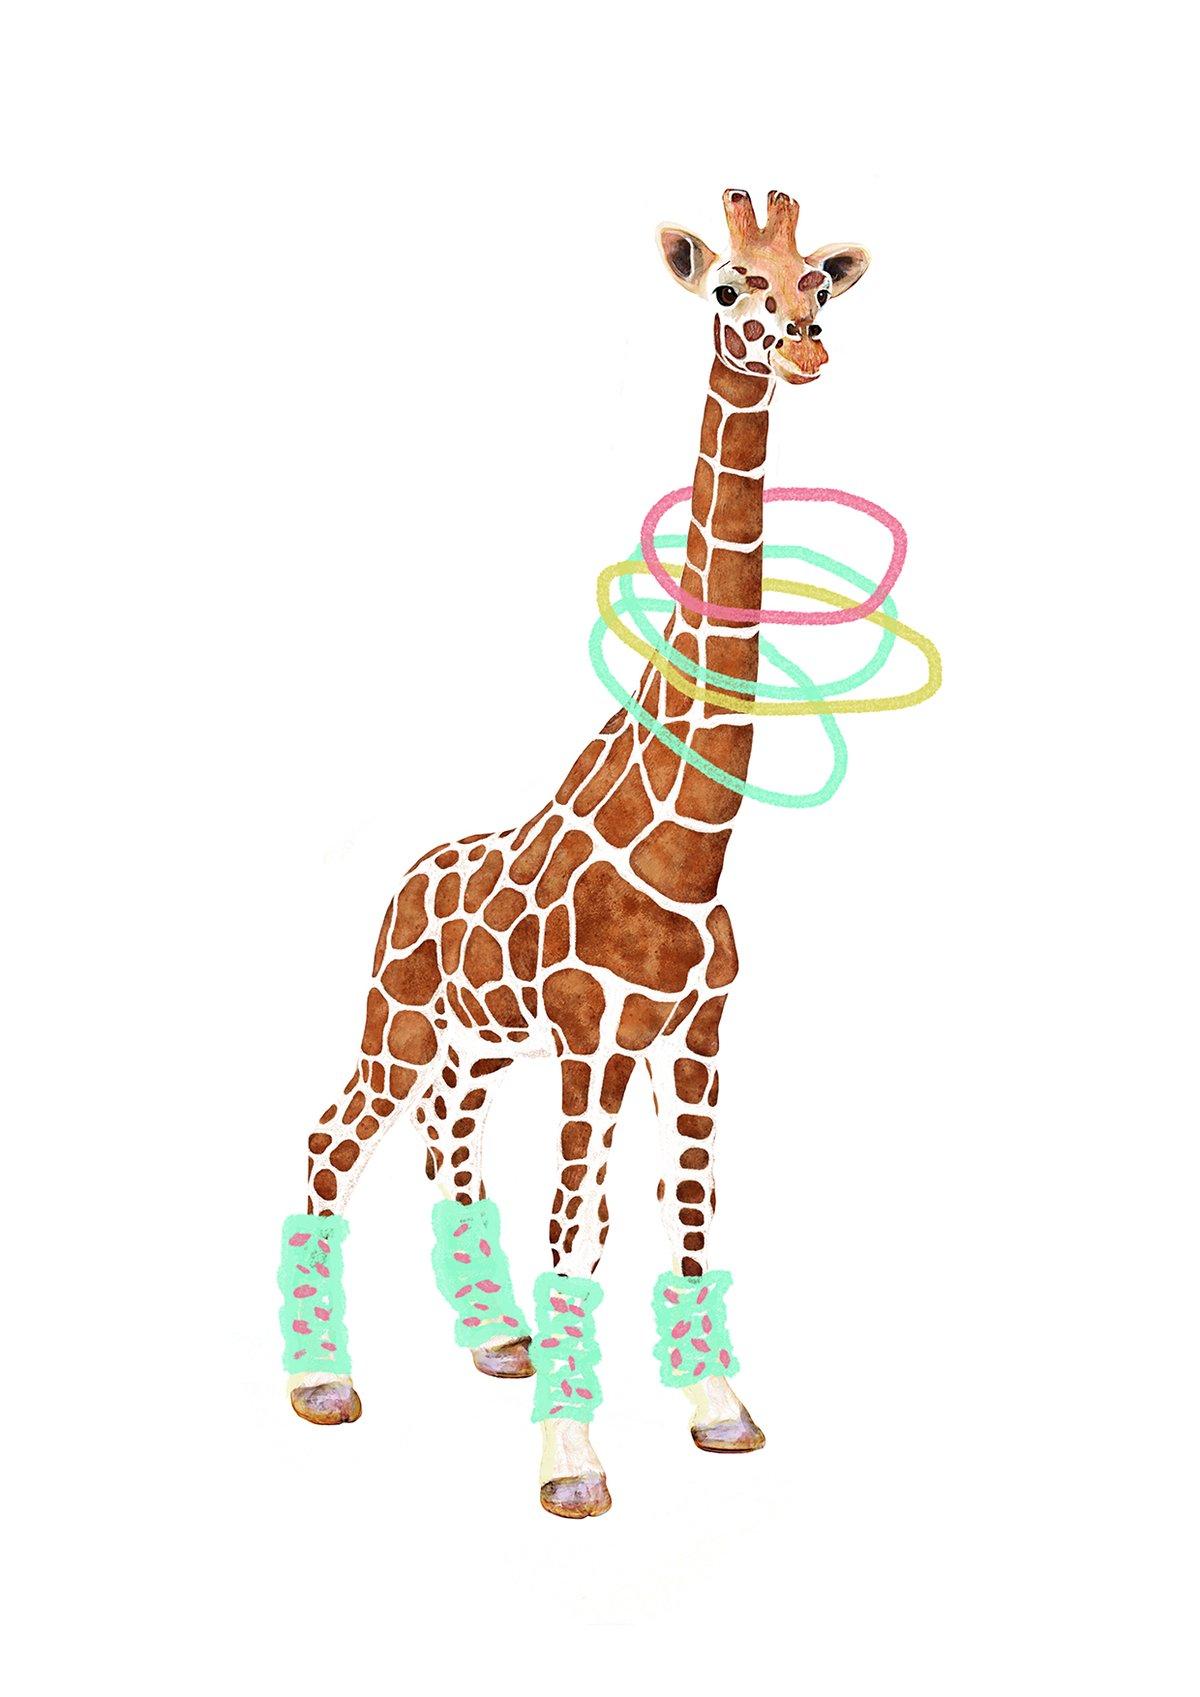 Image of Giraffe Animal Nursery Print